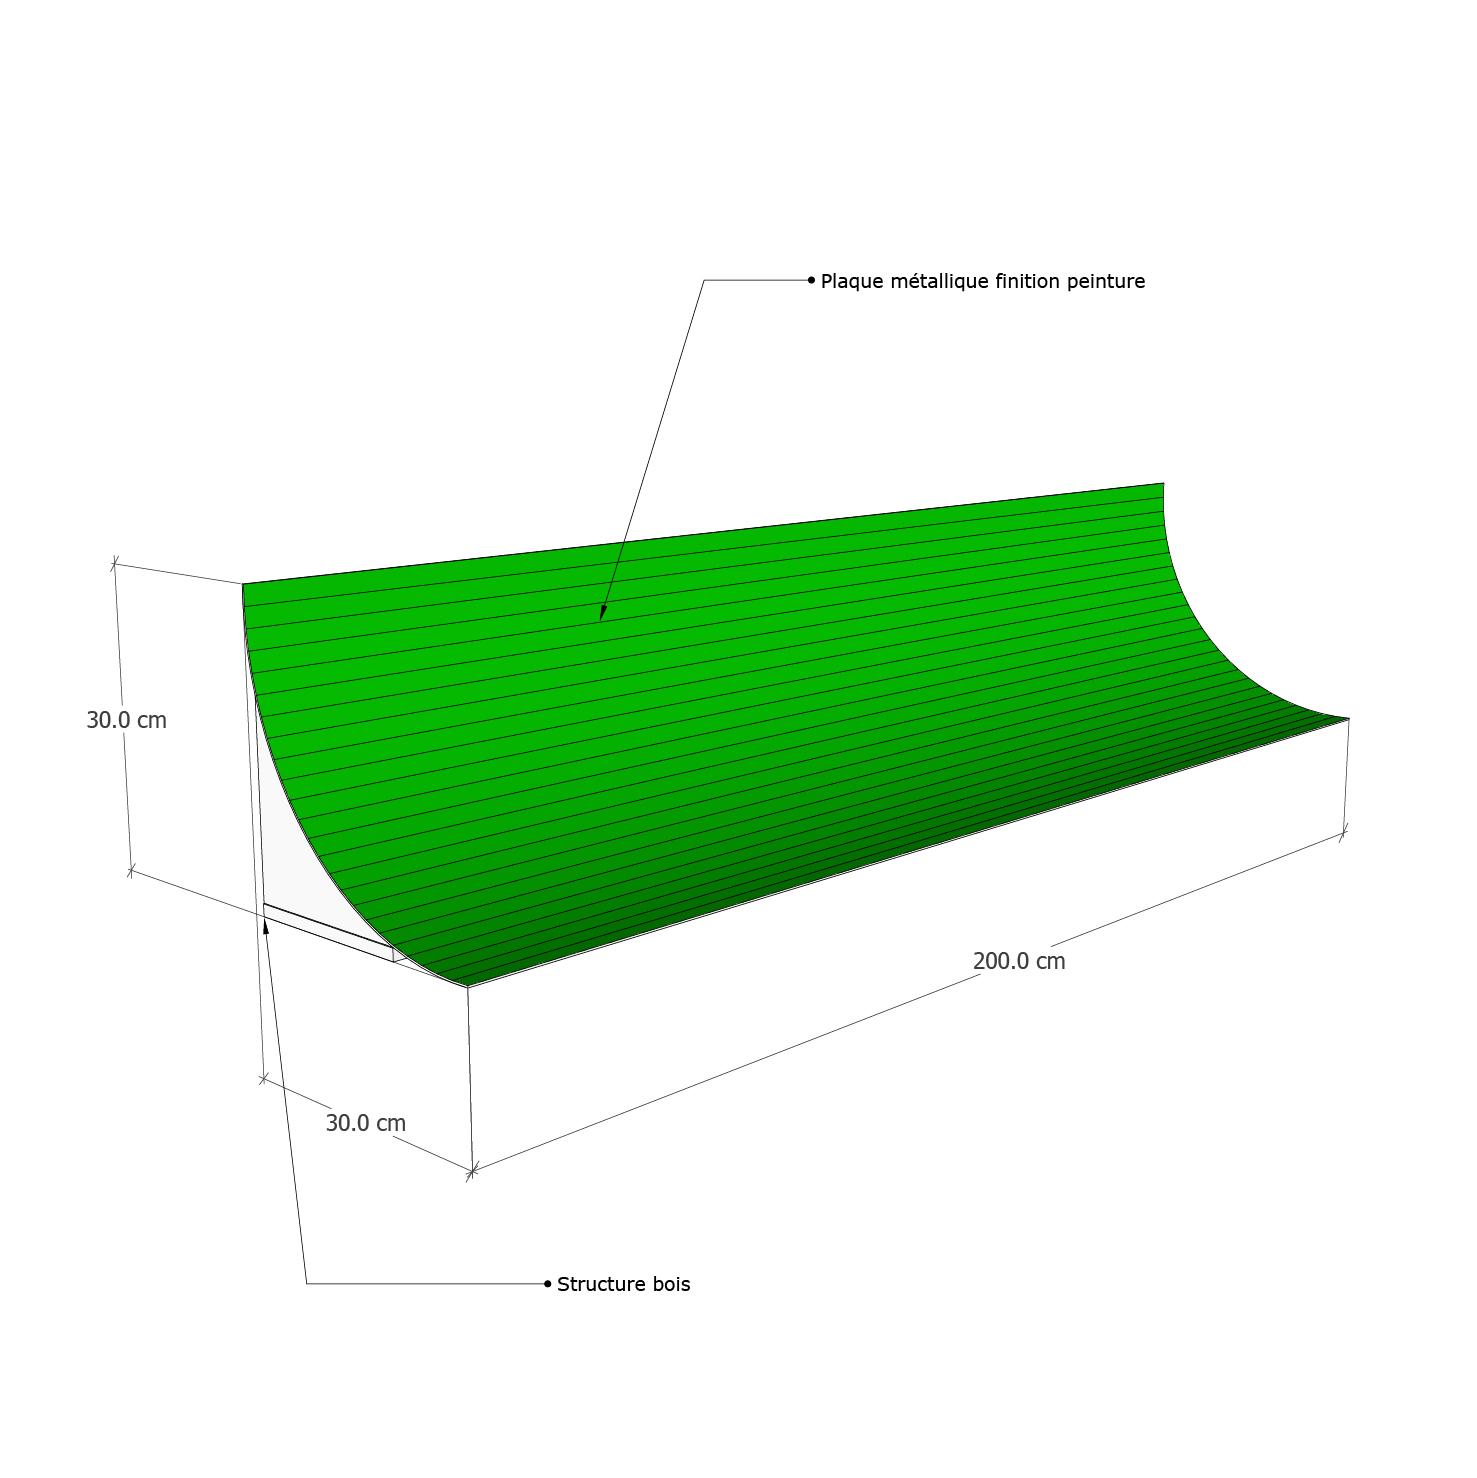 Structure fond vert cyclo droit